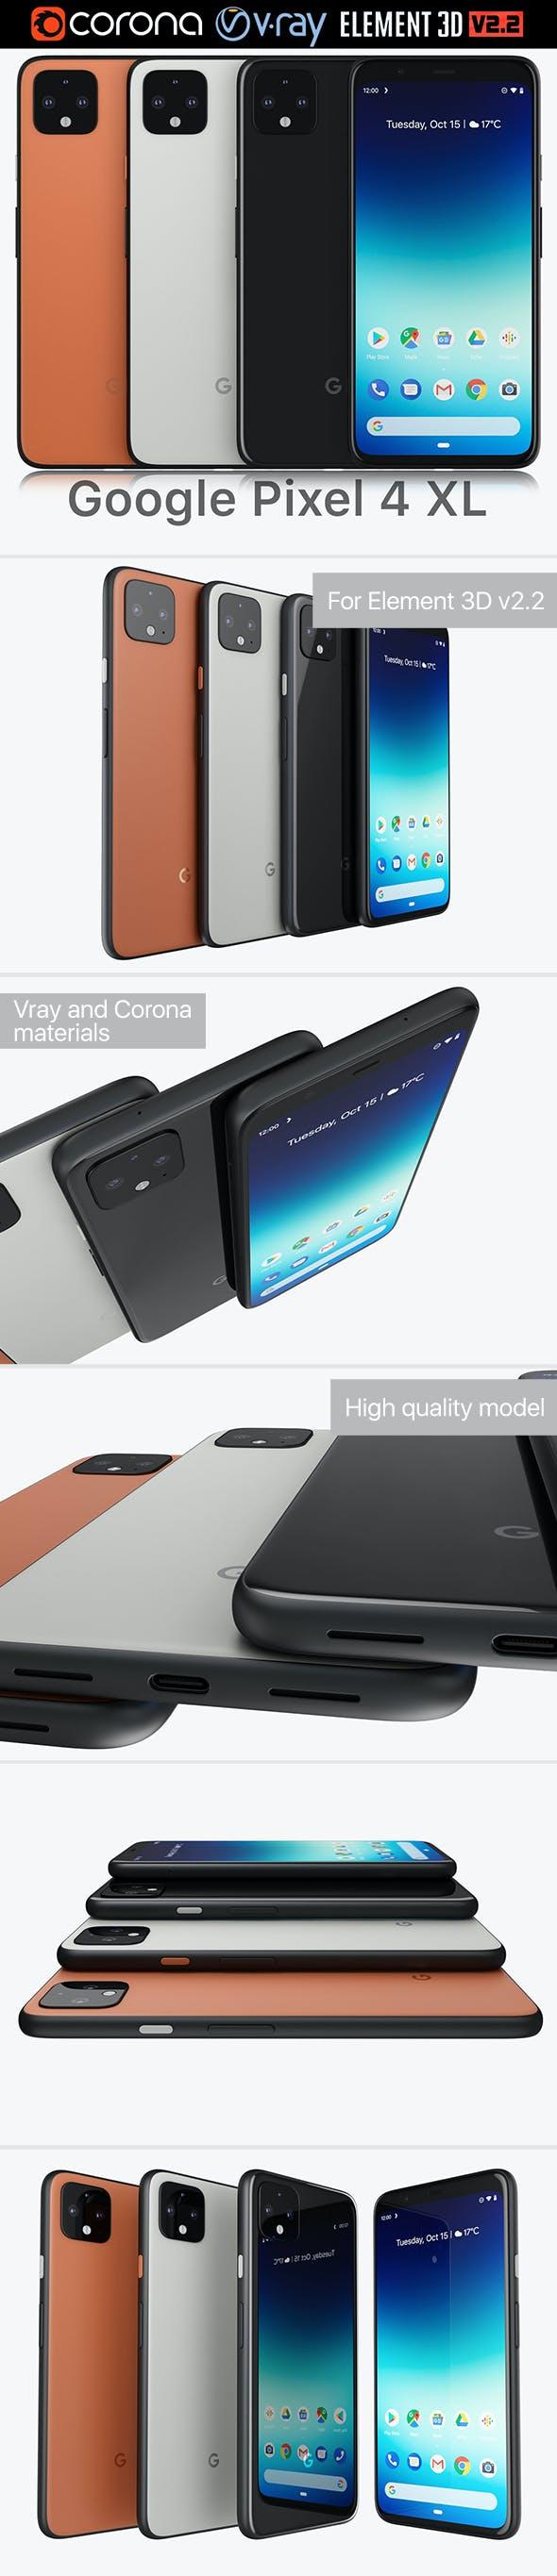 Google Pixel 4 XL - 3DOcean Item for Sale